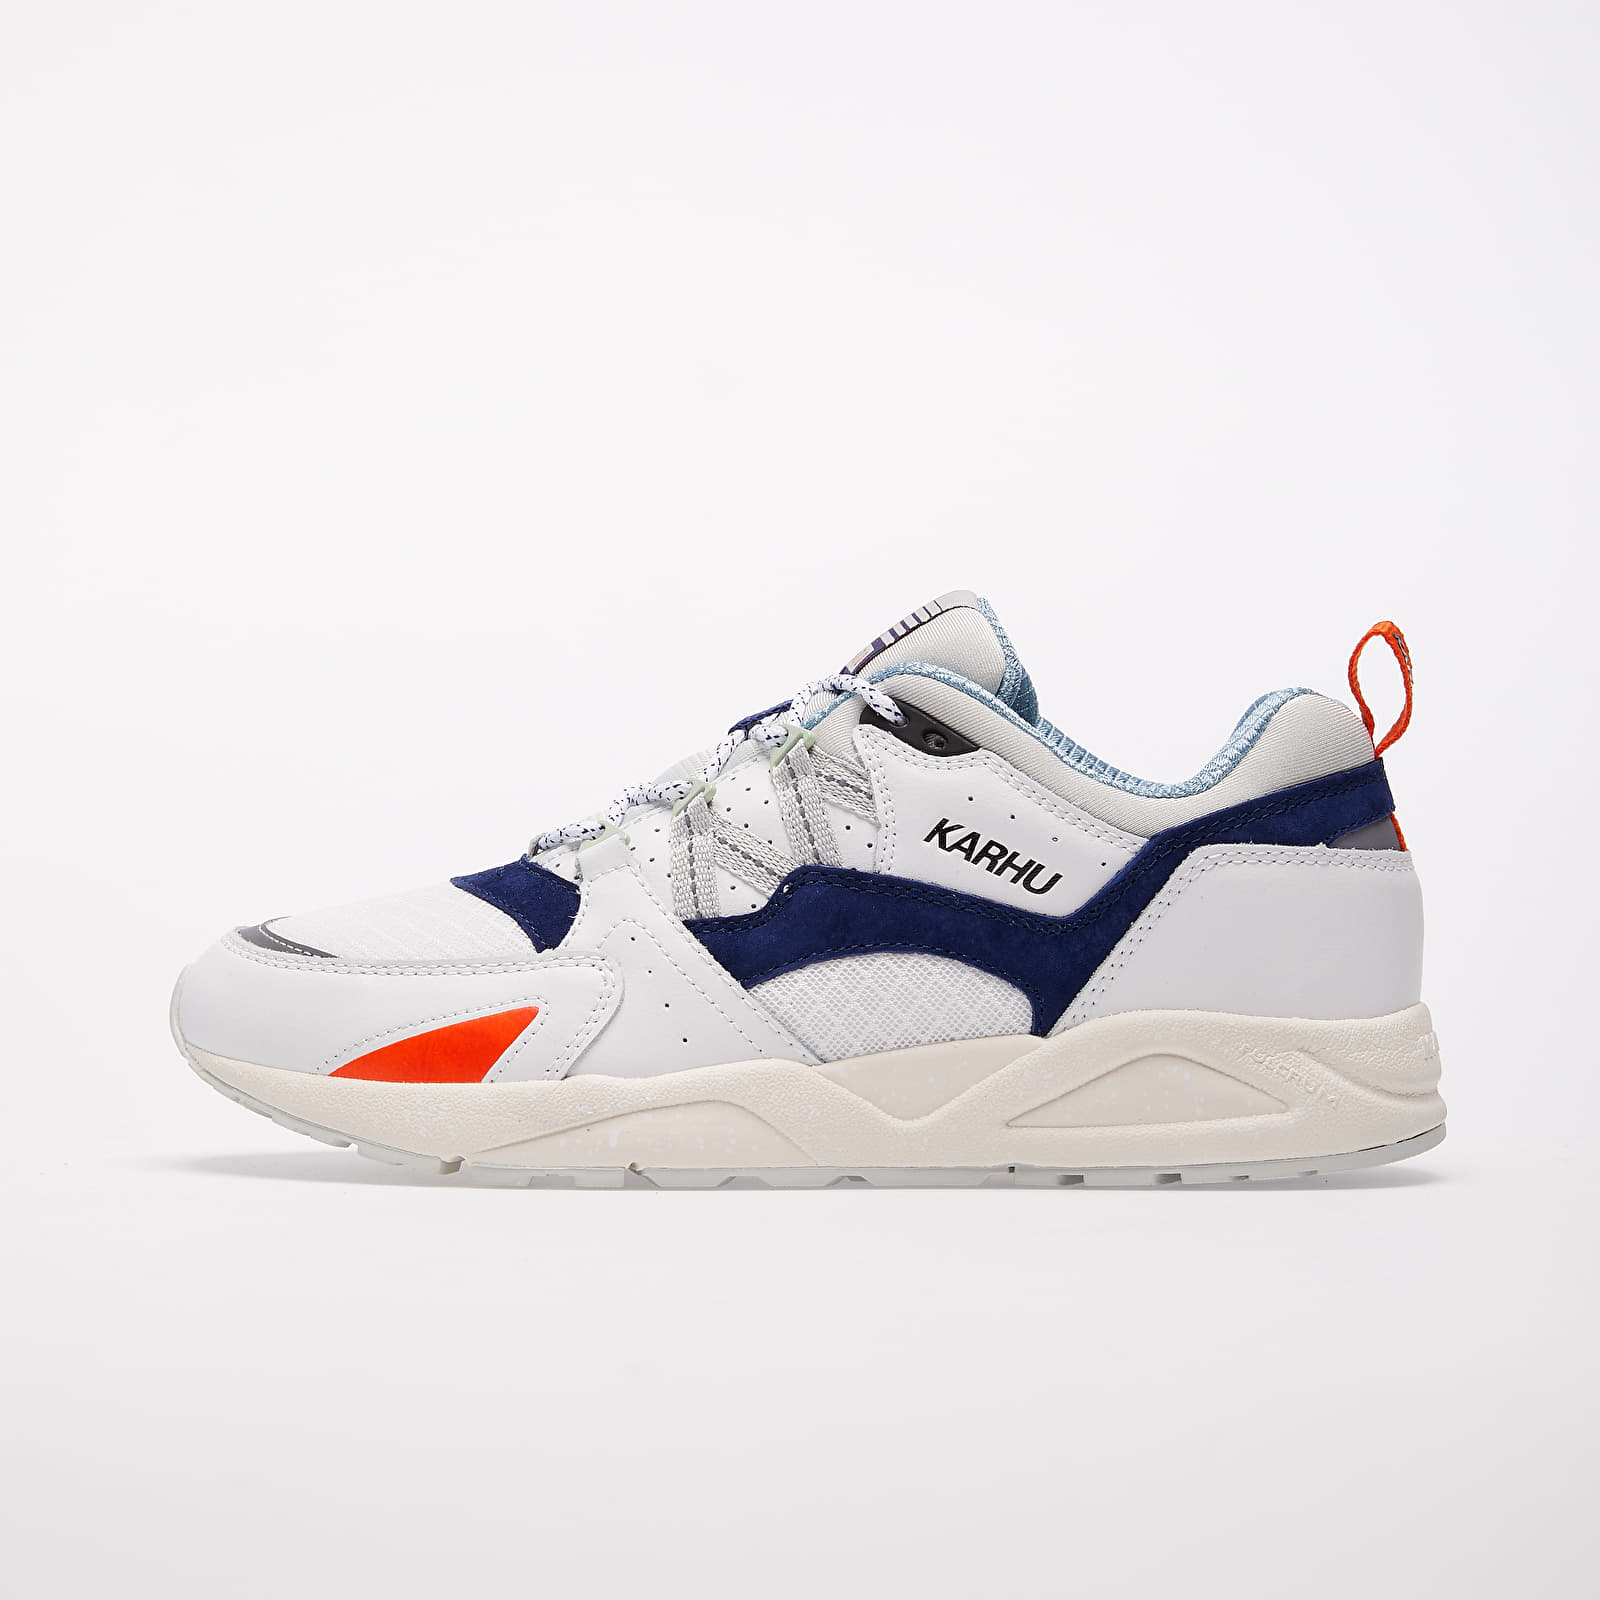 Men's shoes Karhu Fusion 2.0 White/ Twilight Blue